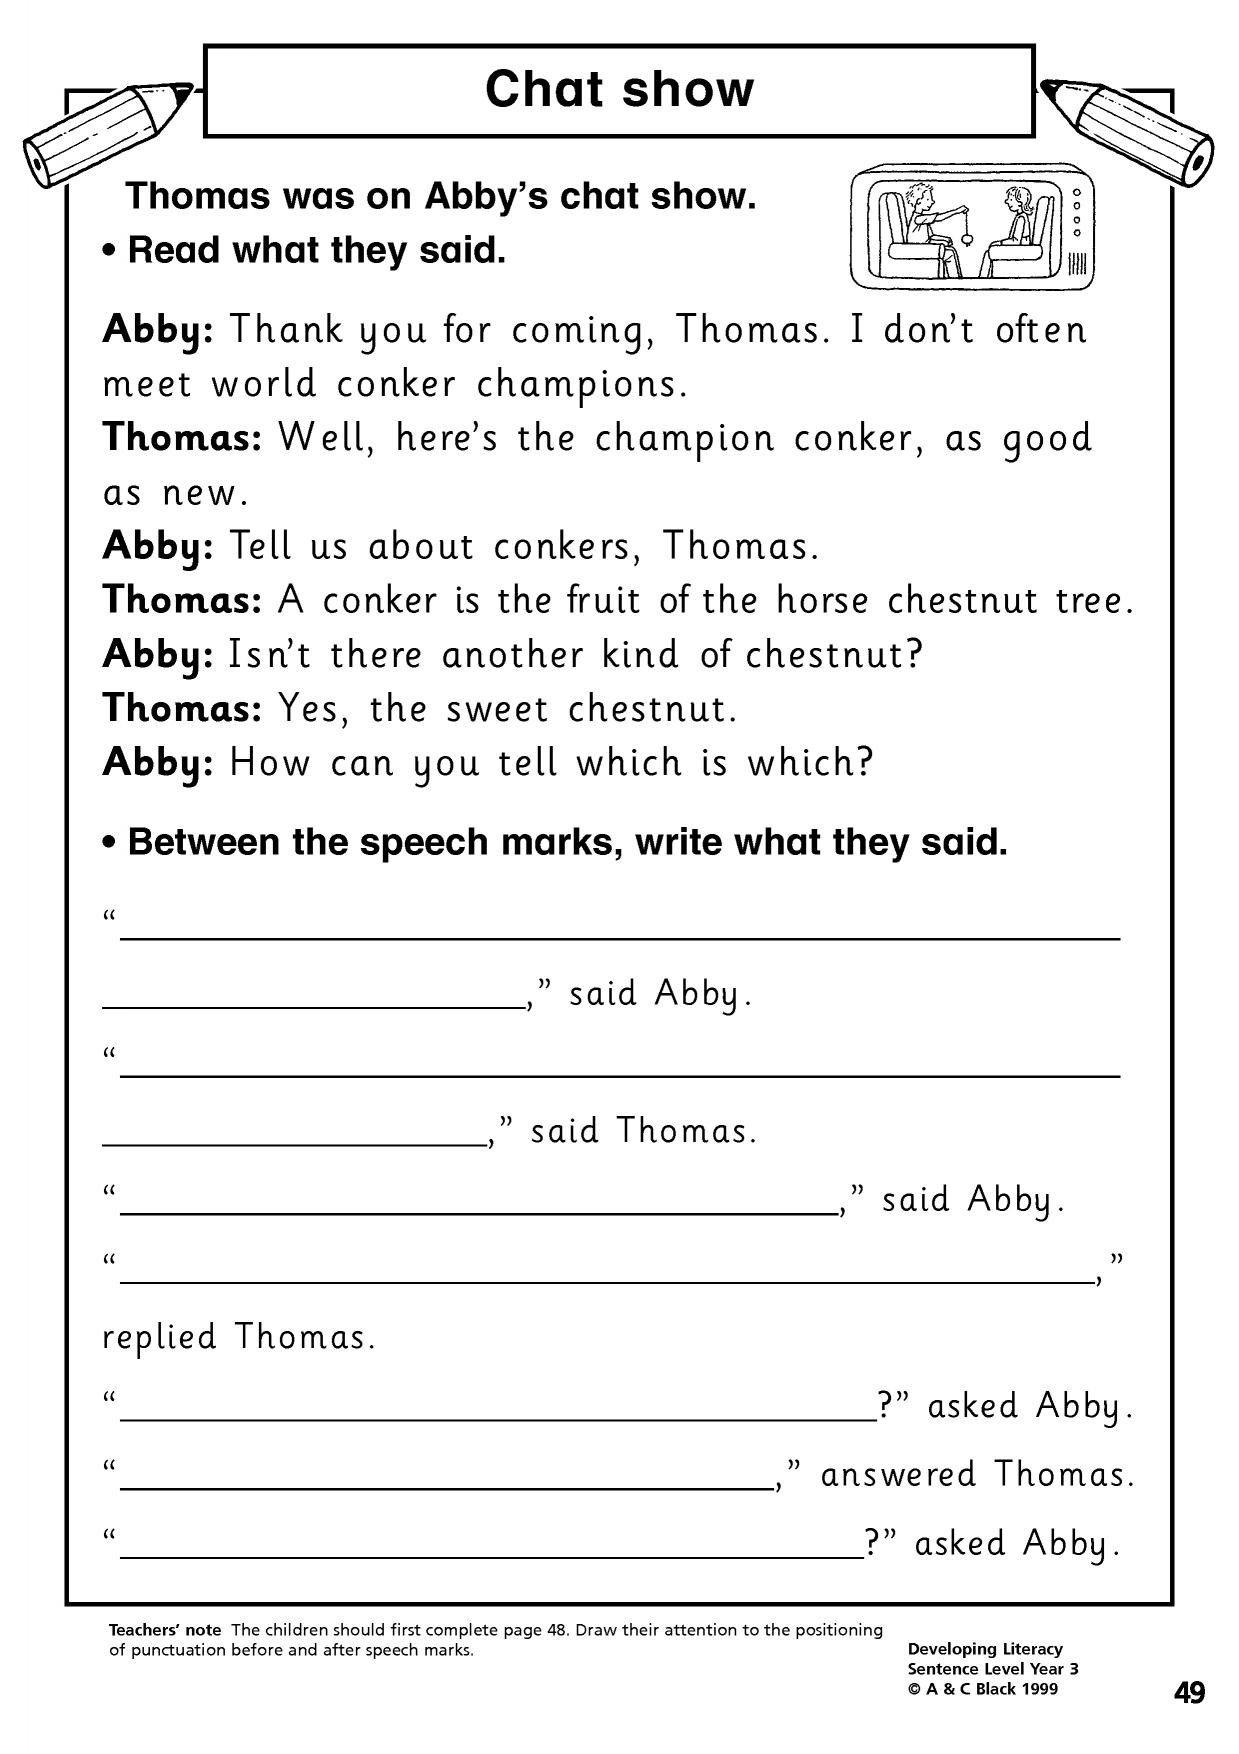 Commas Worksheet 5th Grade Writing Punctuation Worksheet In 2021 Punctuation Worksheets Kids Worksheets Printables Worksheet Template